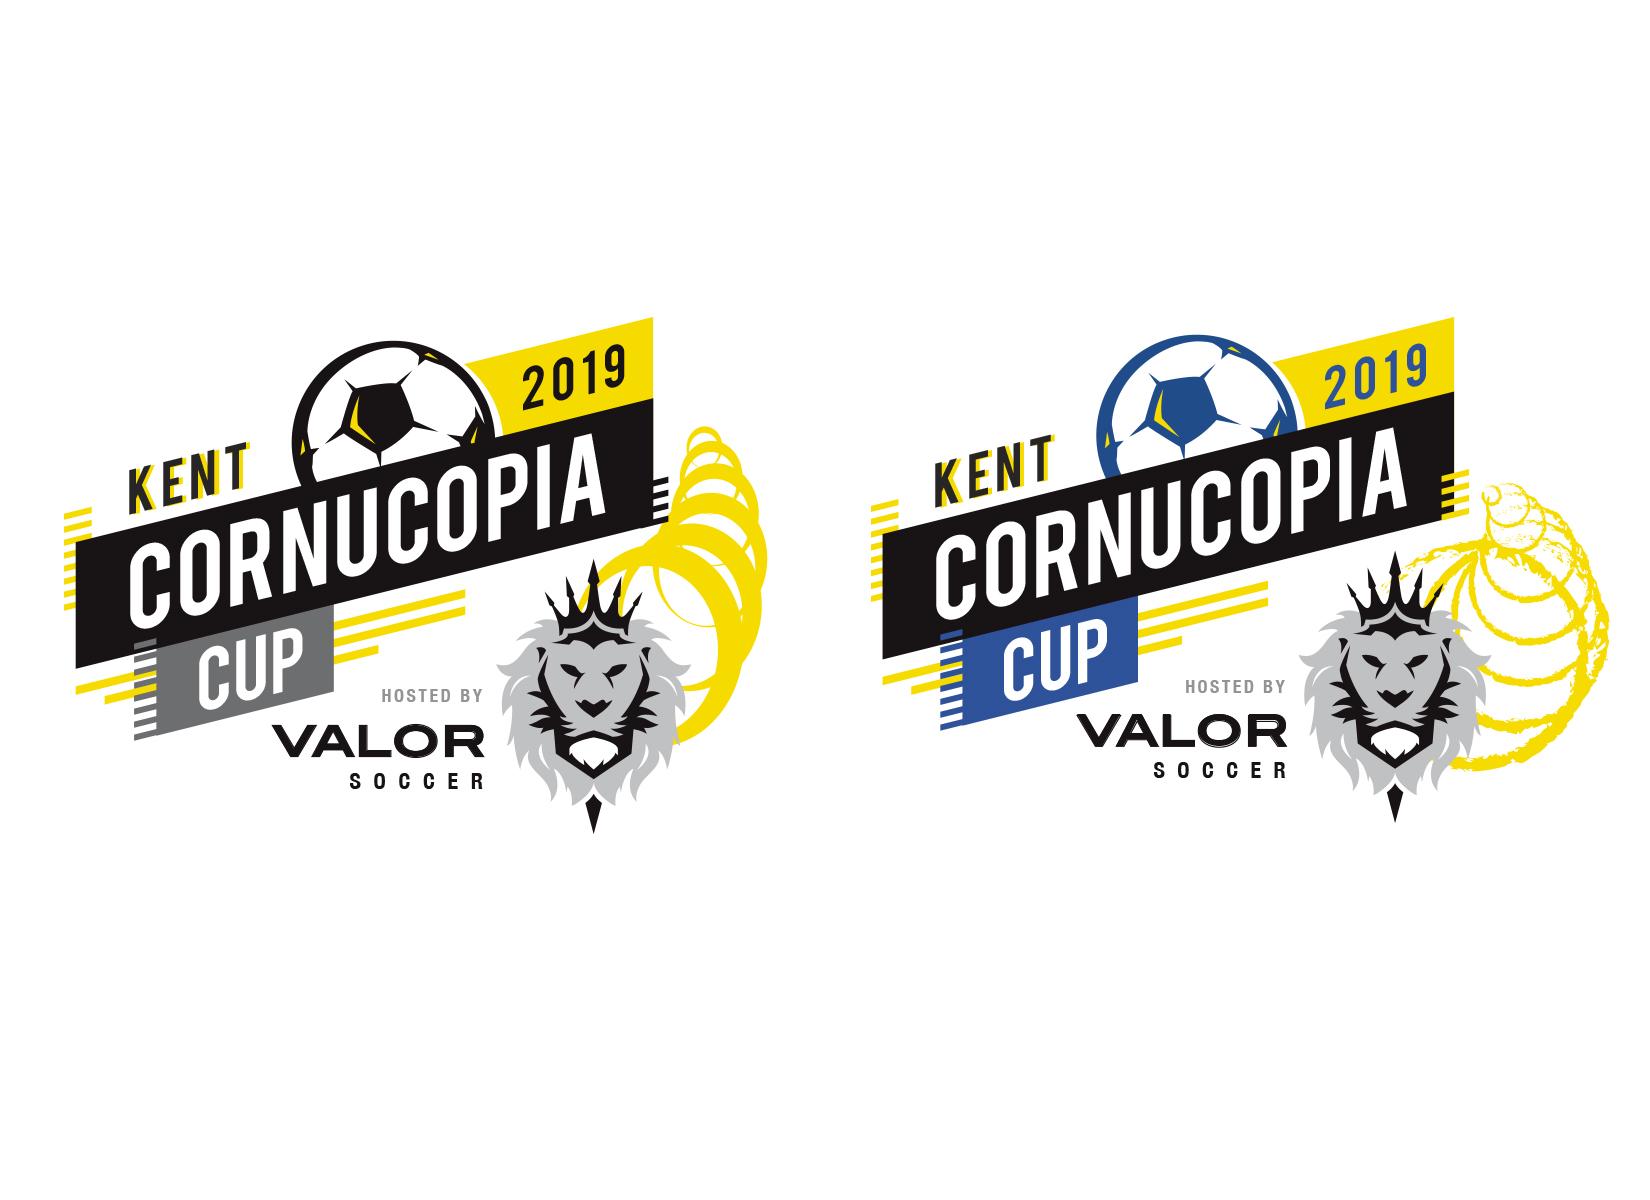 kent-cornucopia-soccer-logo-designs-by-jordan-fretz-5.jpg